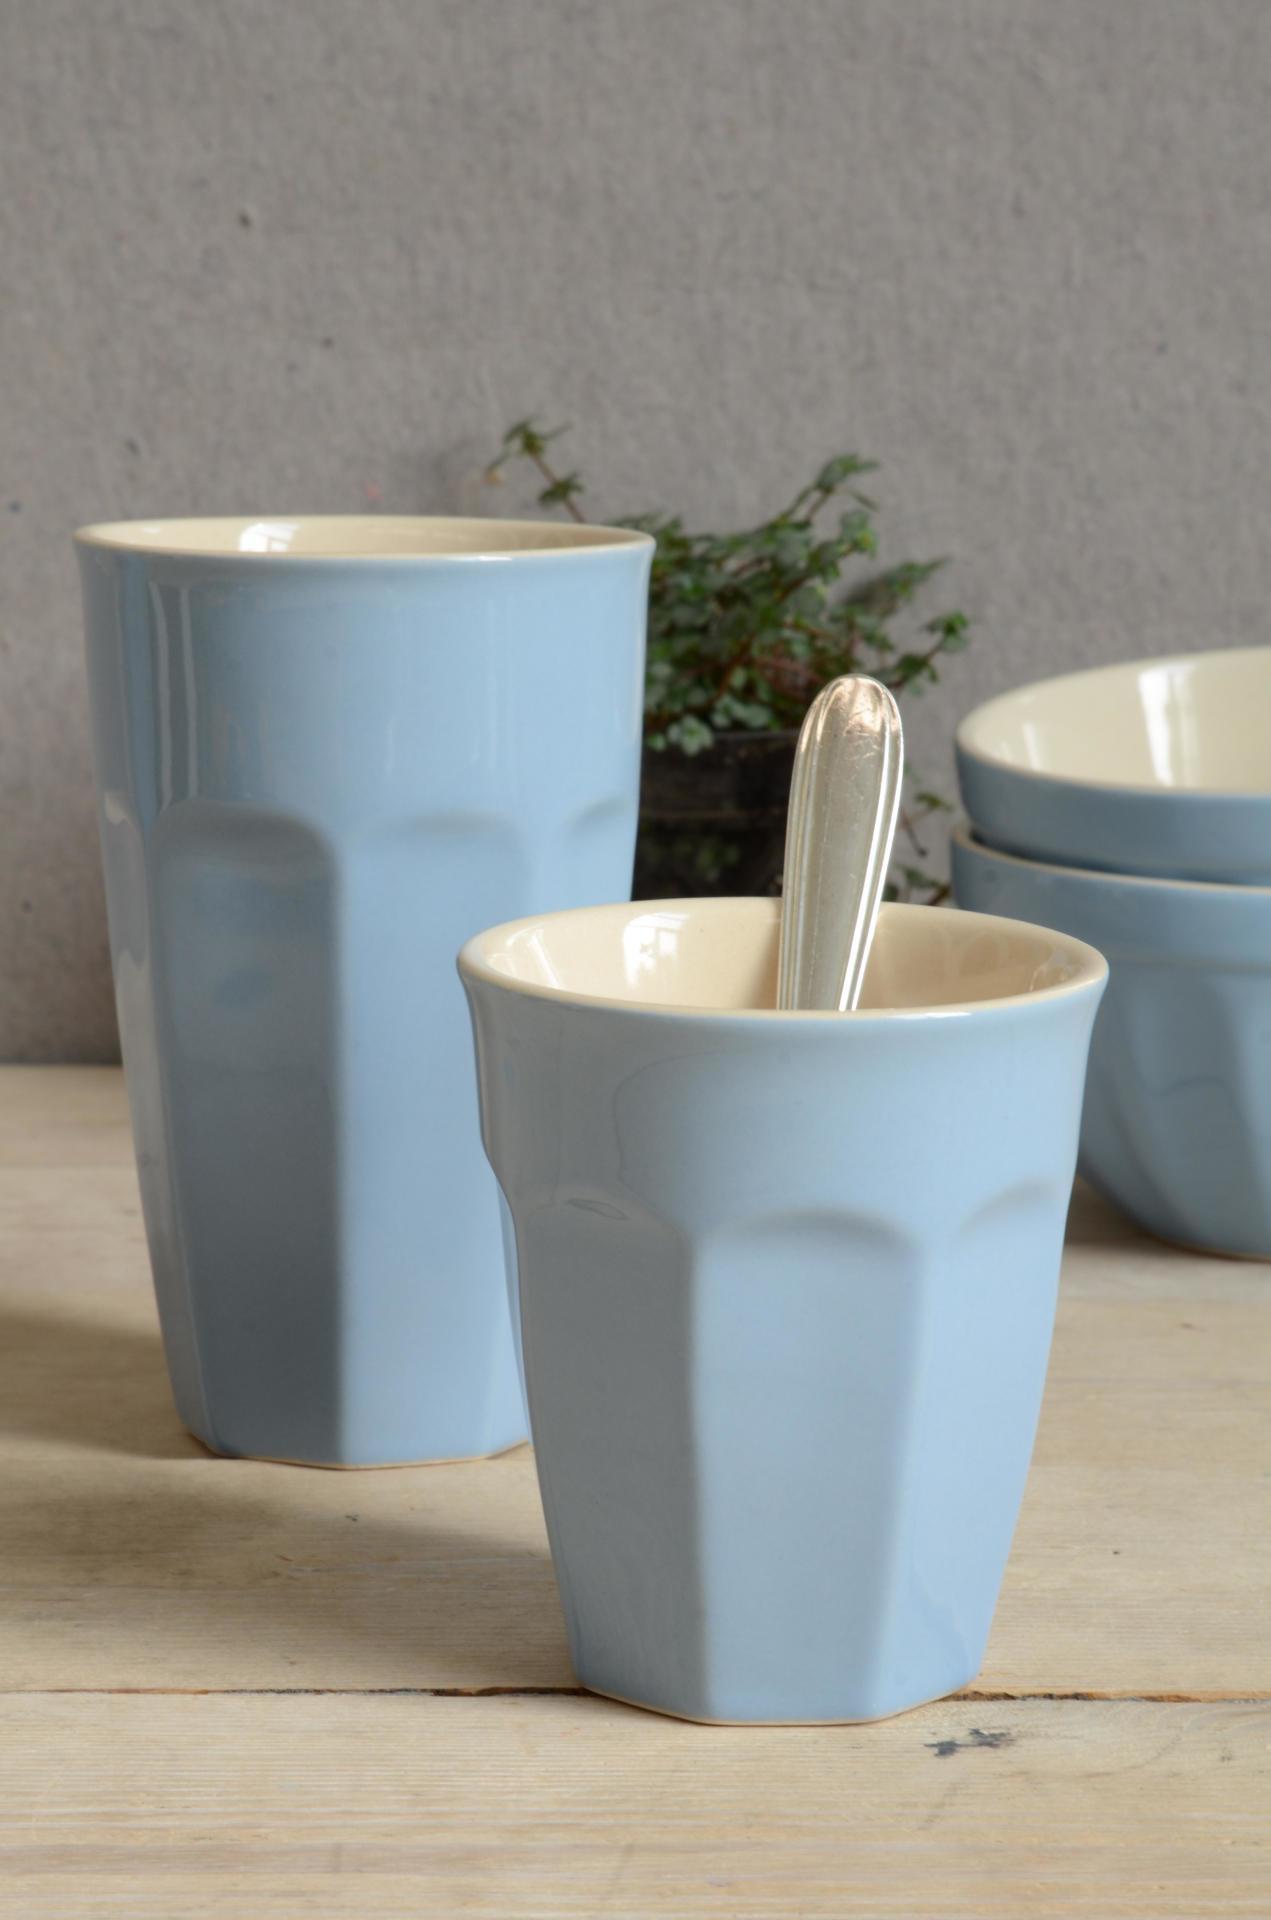 IB LAURSEN Latte hrneček Mynte nordic sky 250 ml, modrá barva, keramika